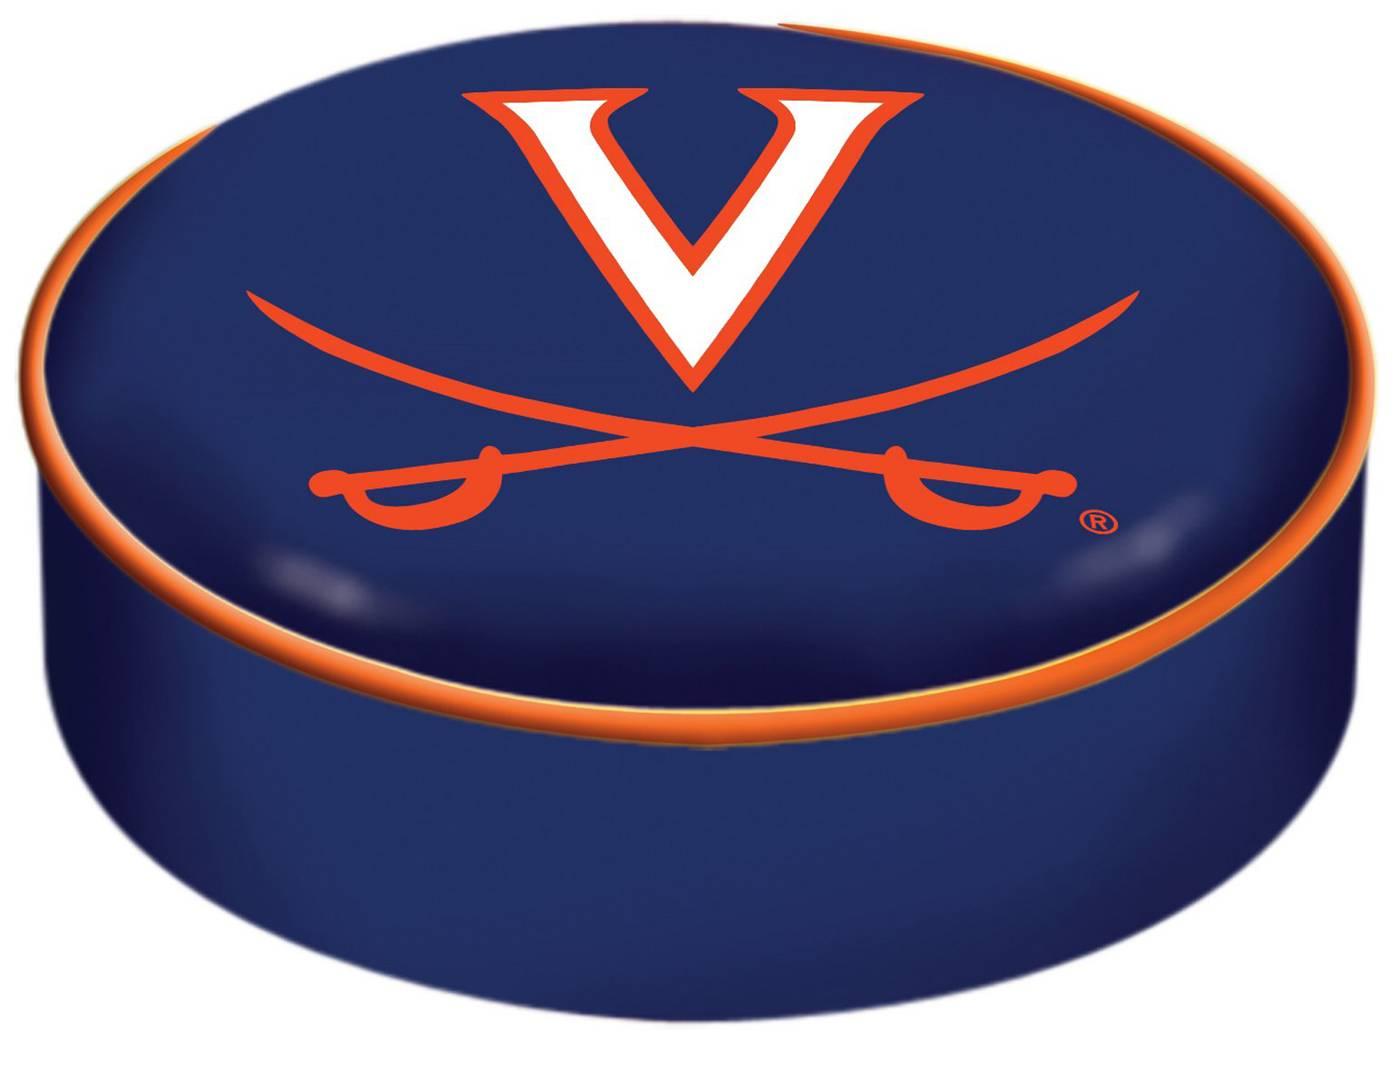 Virginia Cavaliers Bar Stool Seat Cover